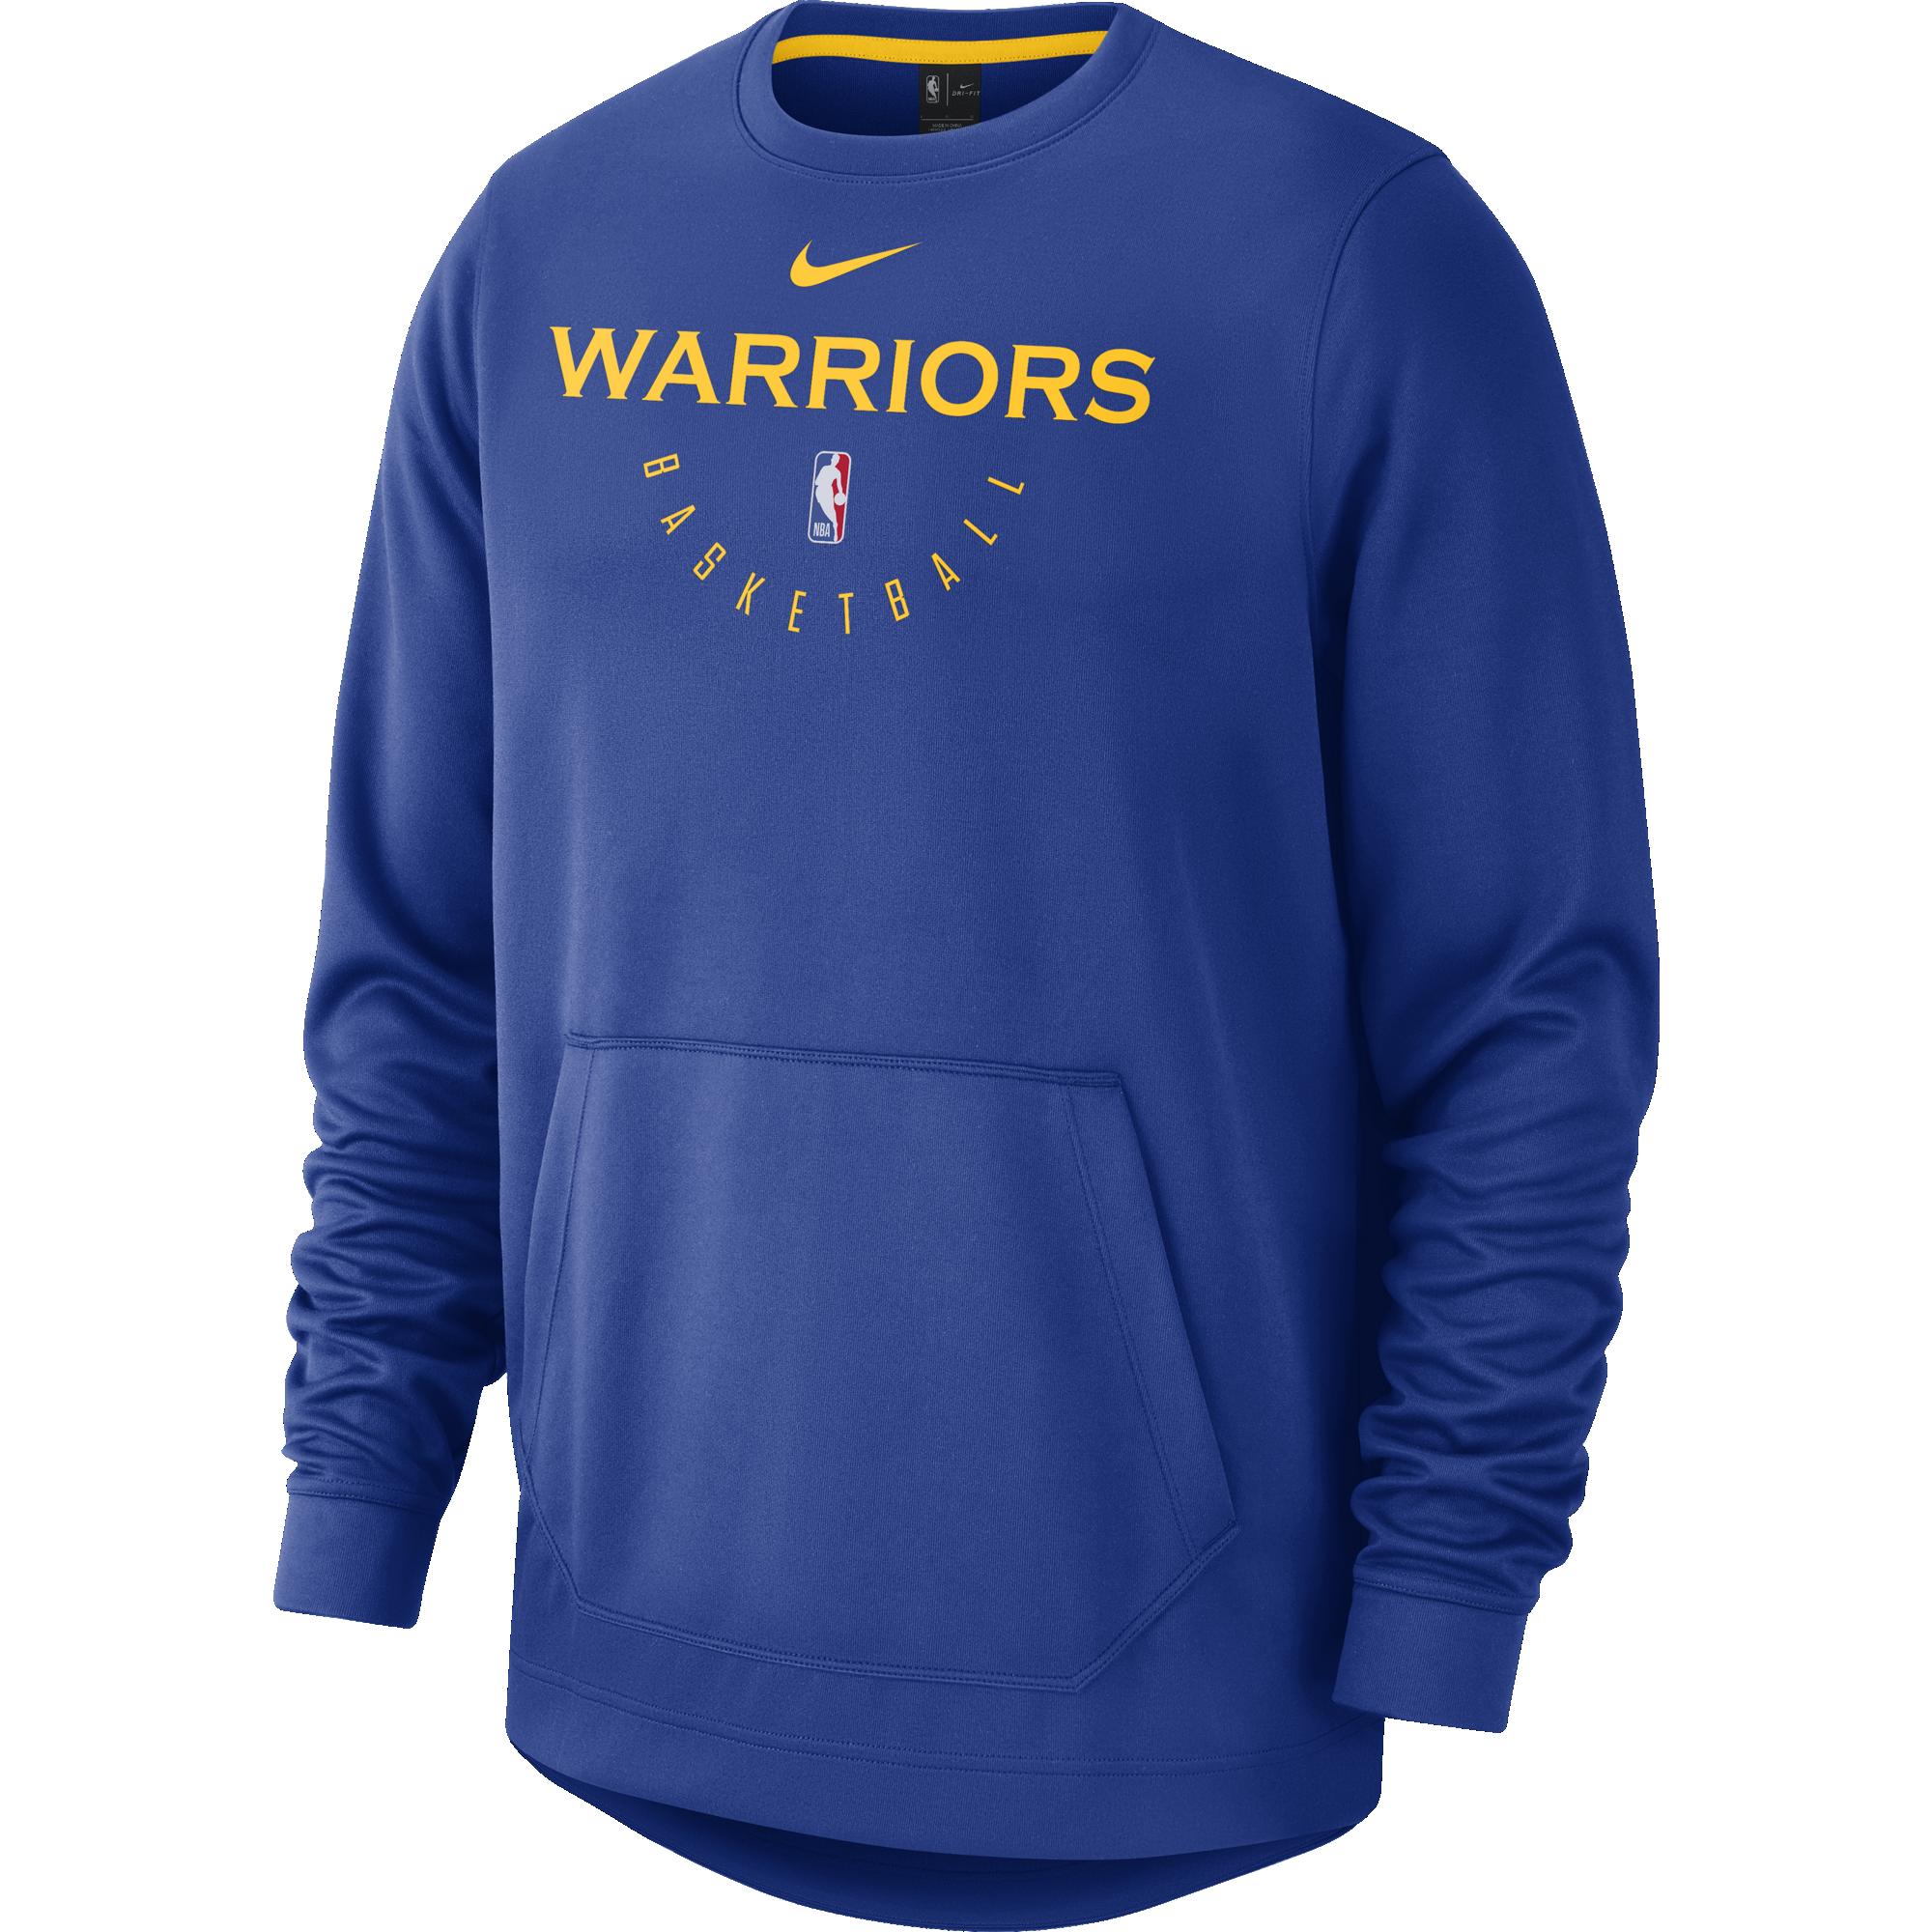 25+ Golden State Warriors Sleeveless Hoodie Nike PNG